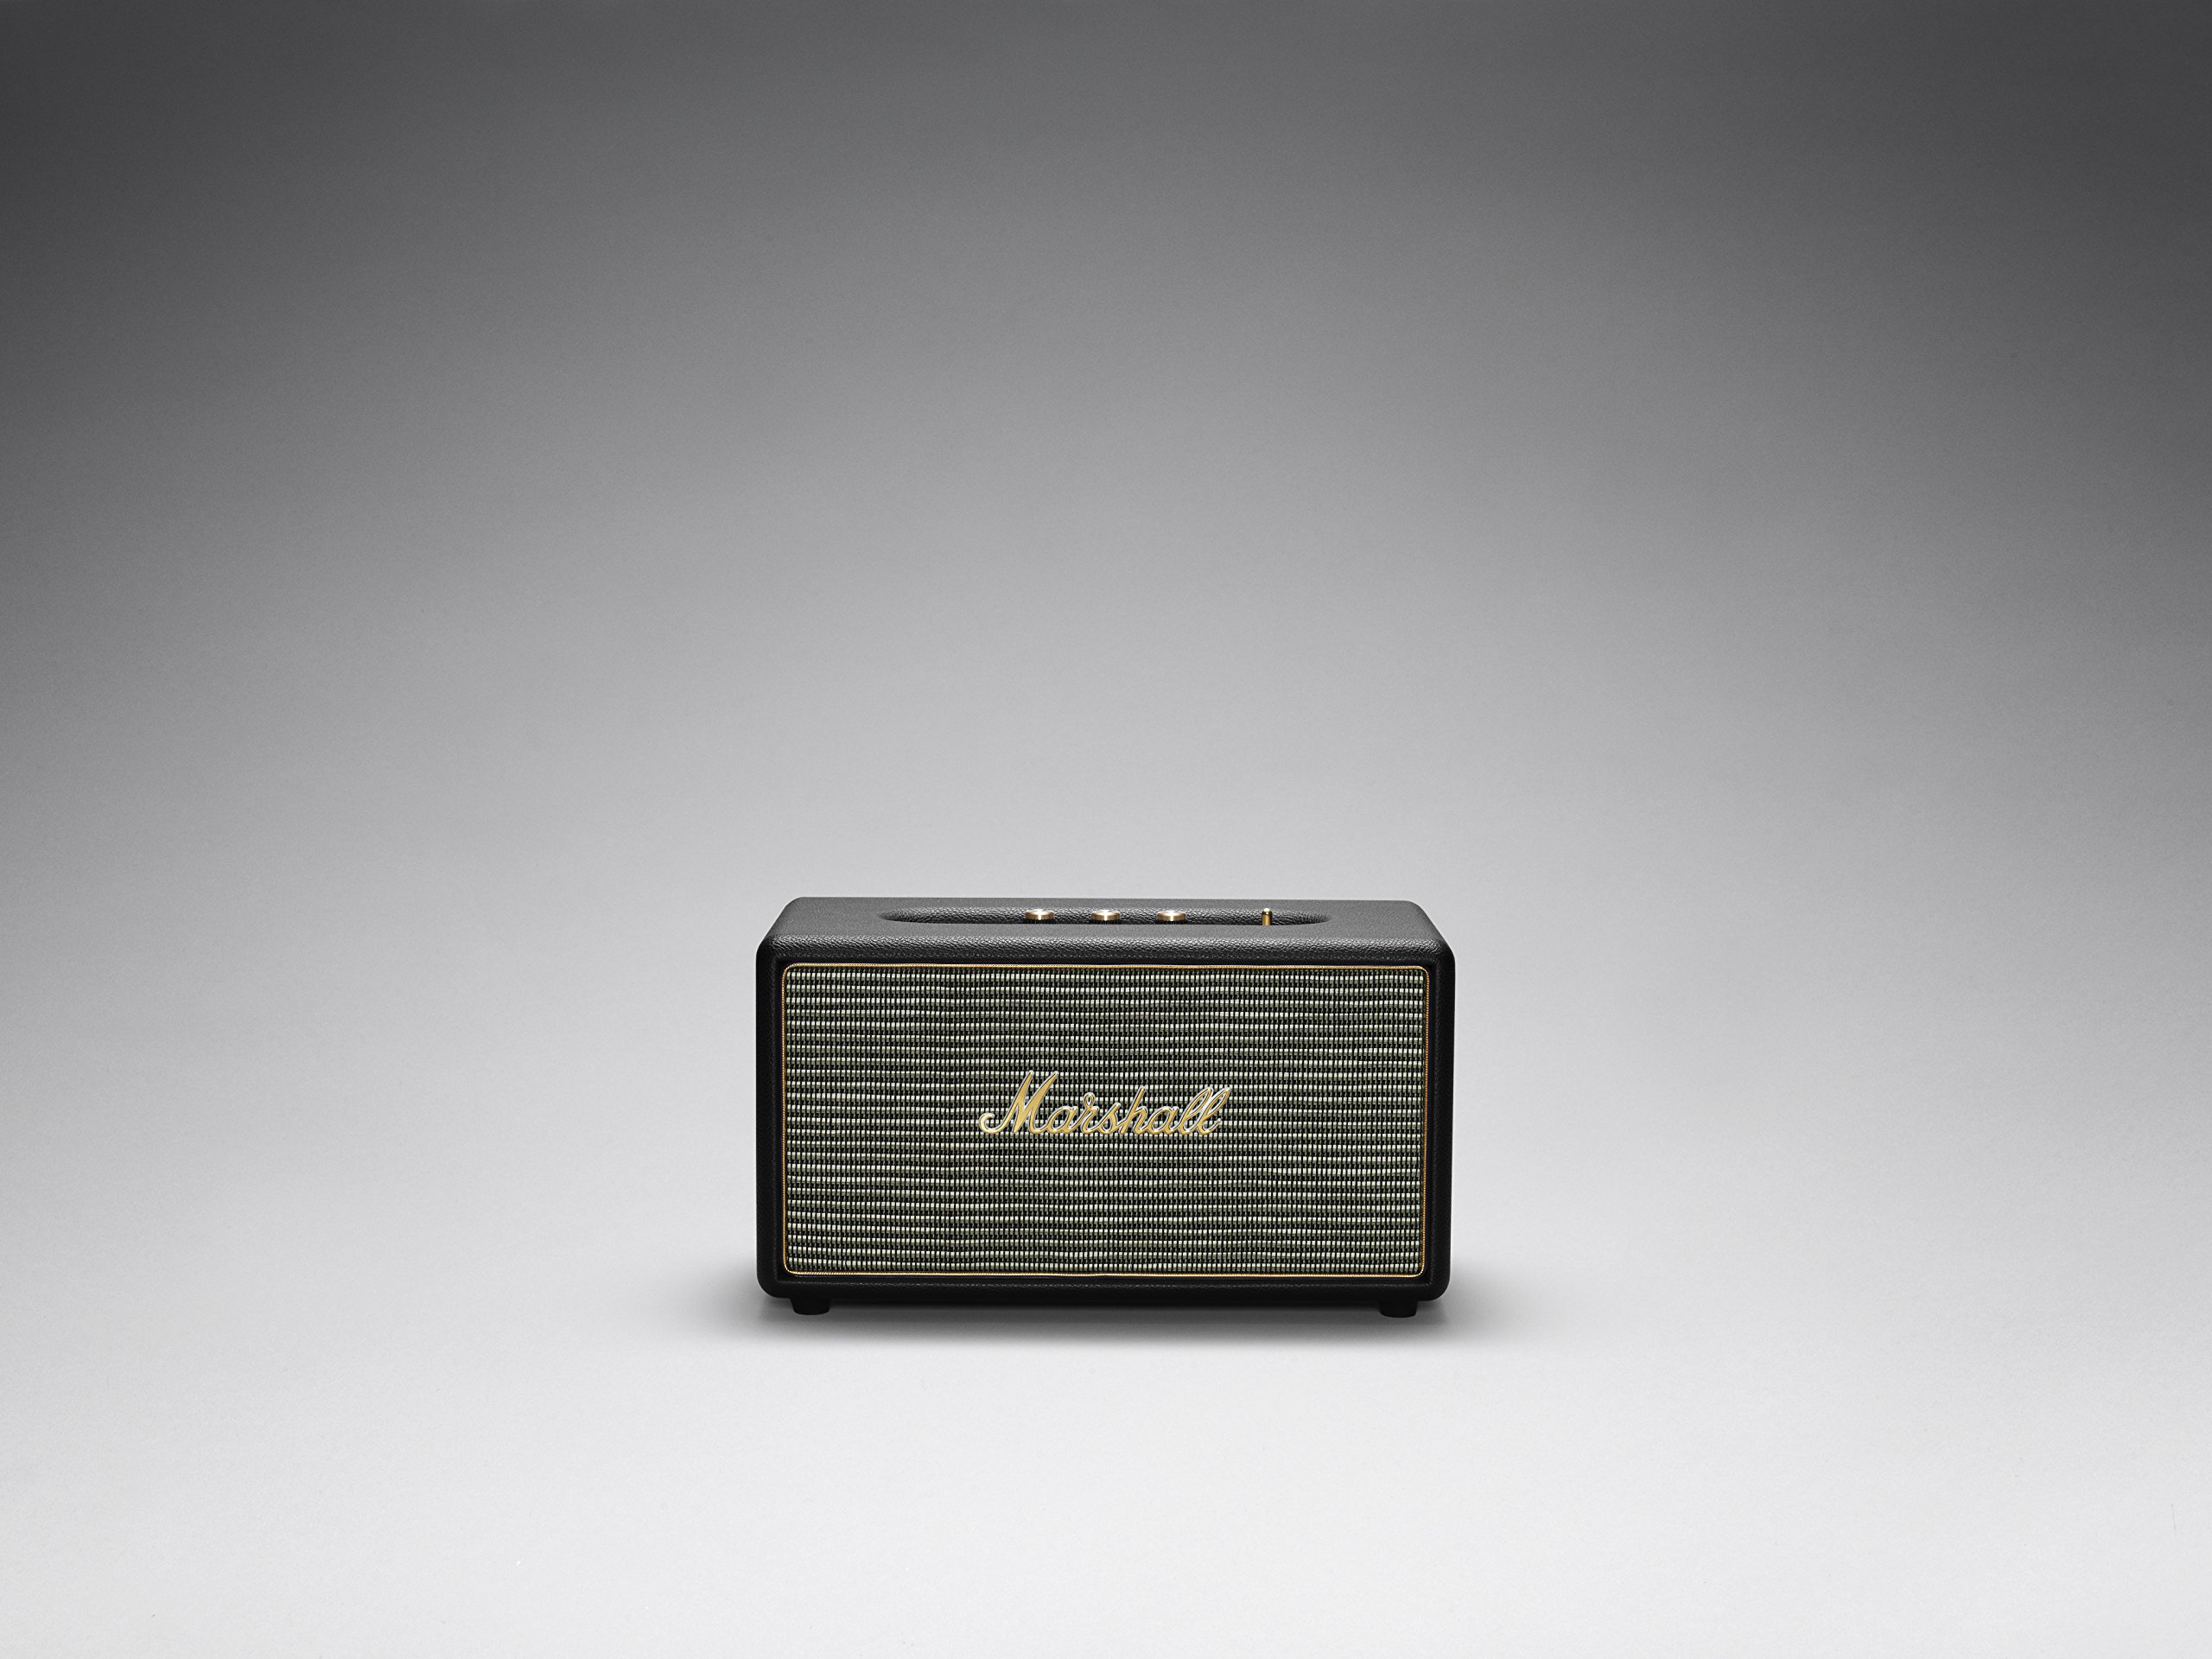 Marshall Stanmore Bluetooth Speaker, Black (04091627) by Marshall (Image #3)